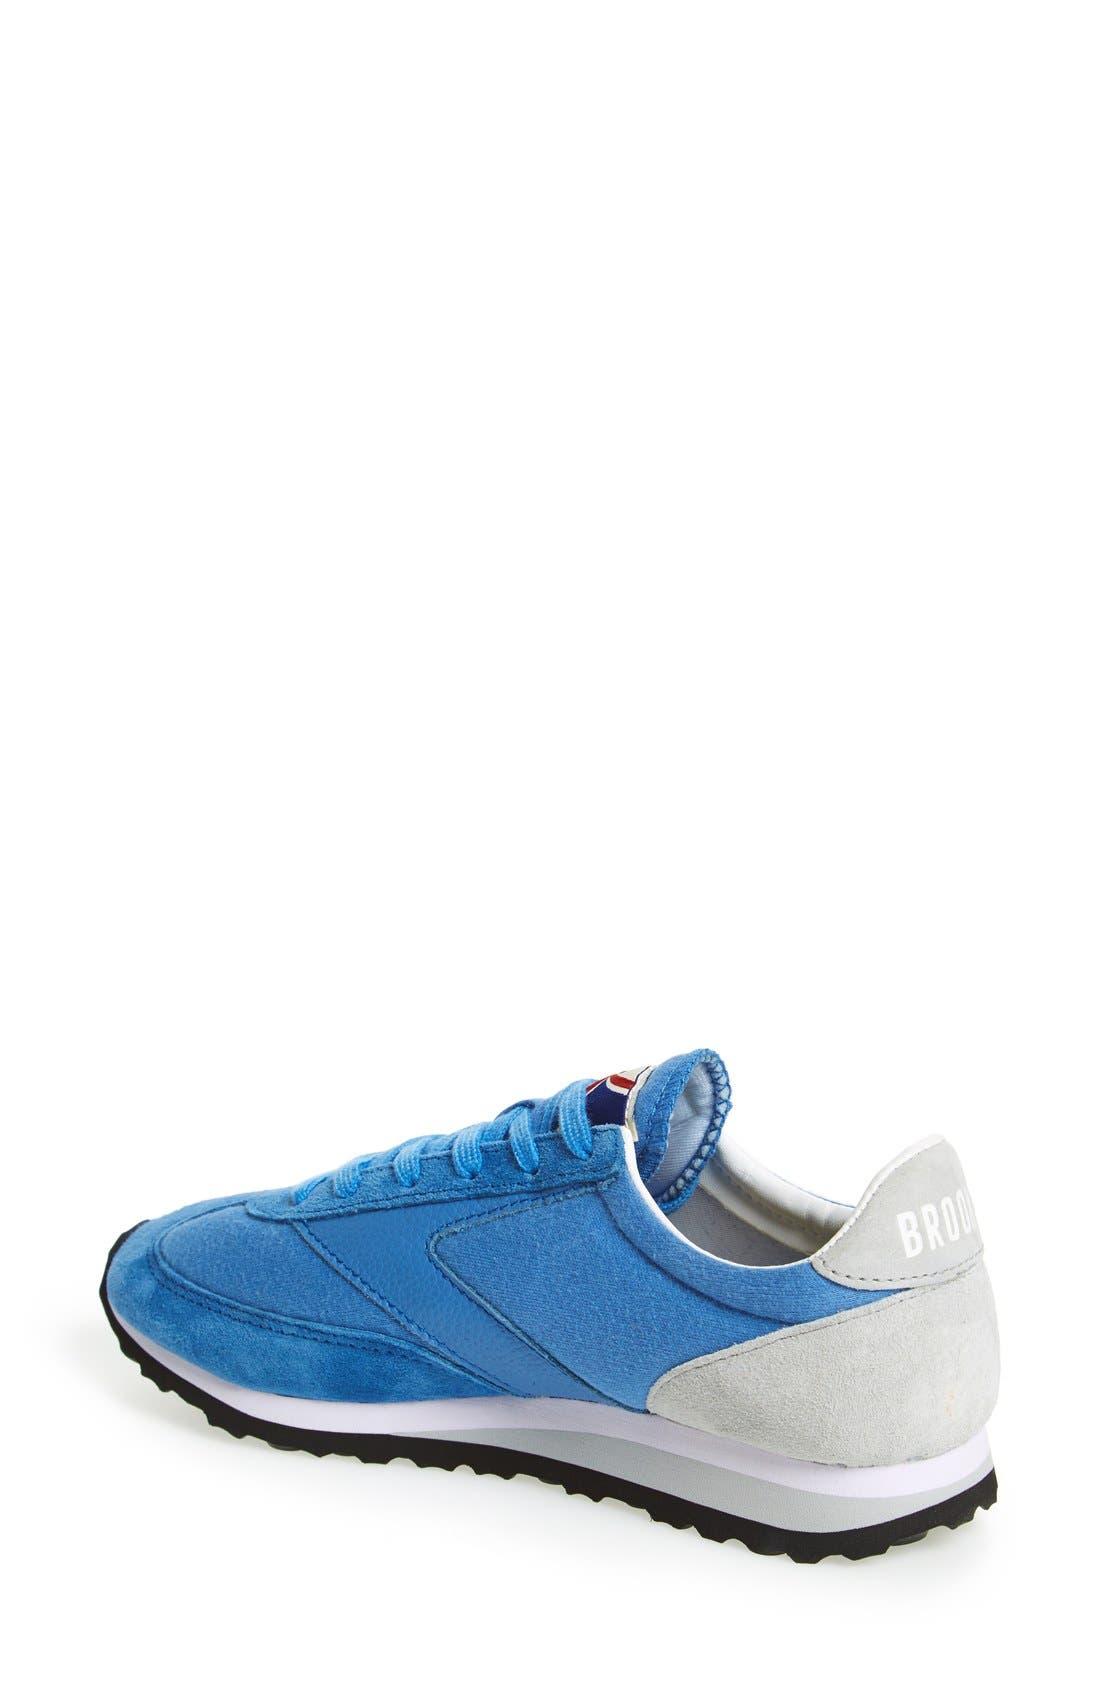 'Vanguard' Sneaker,                             Alternate thumbnail 130, color,